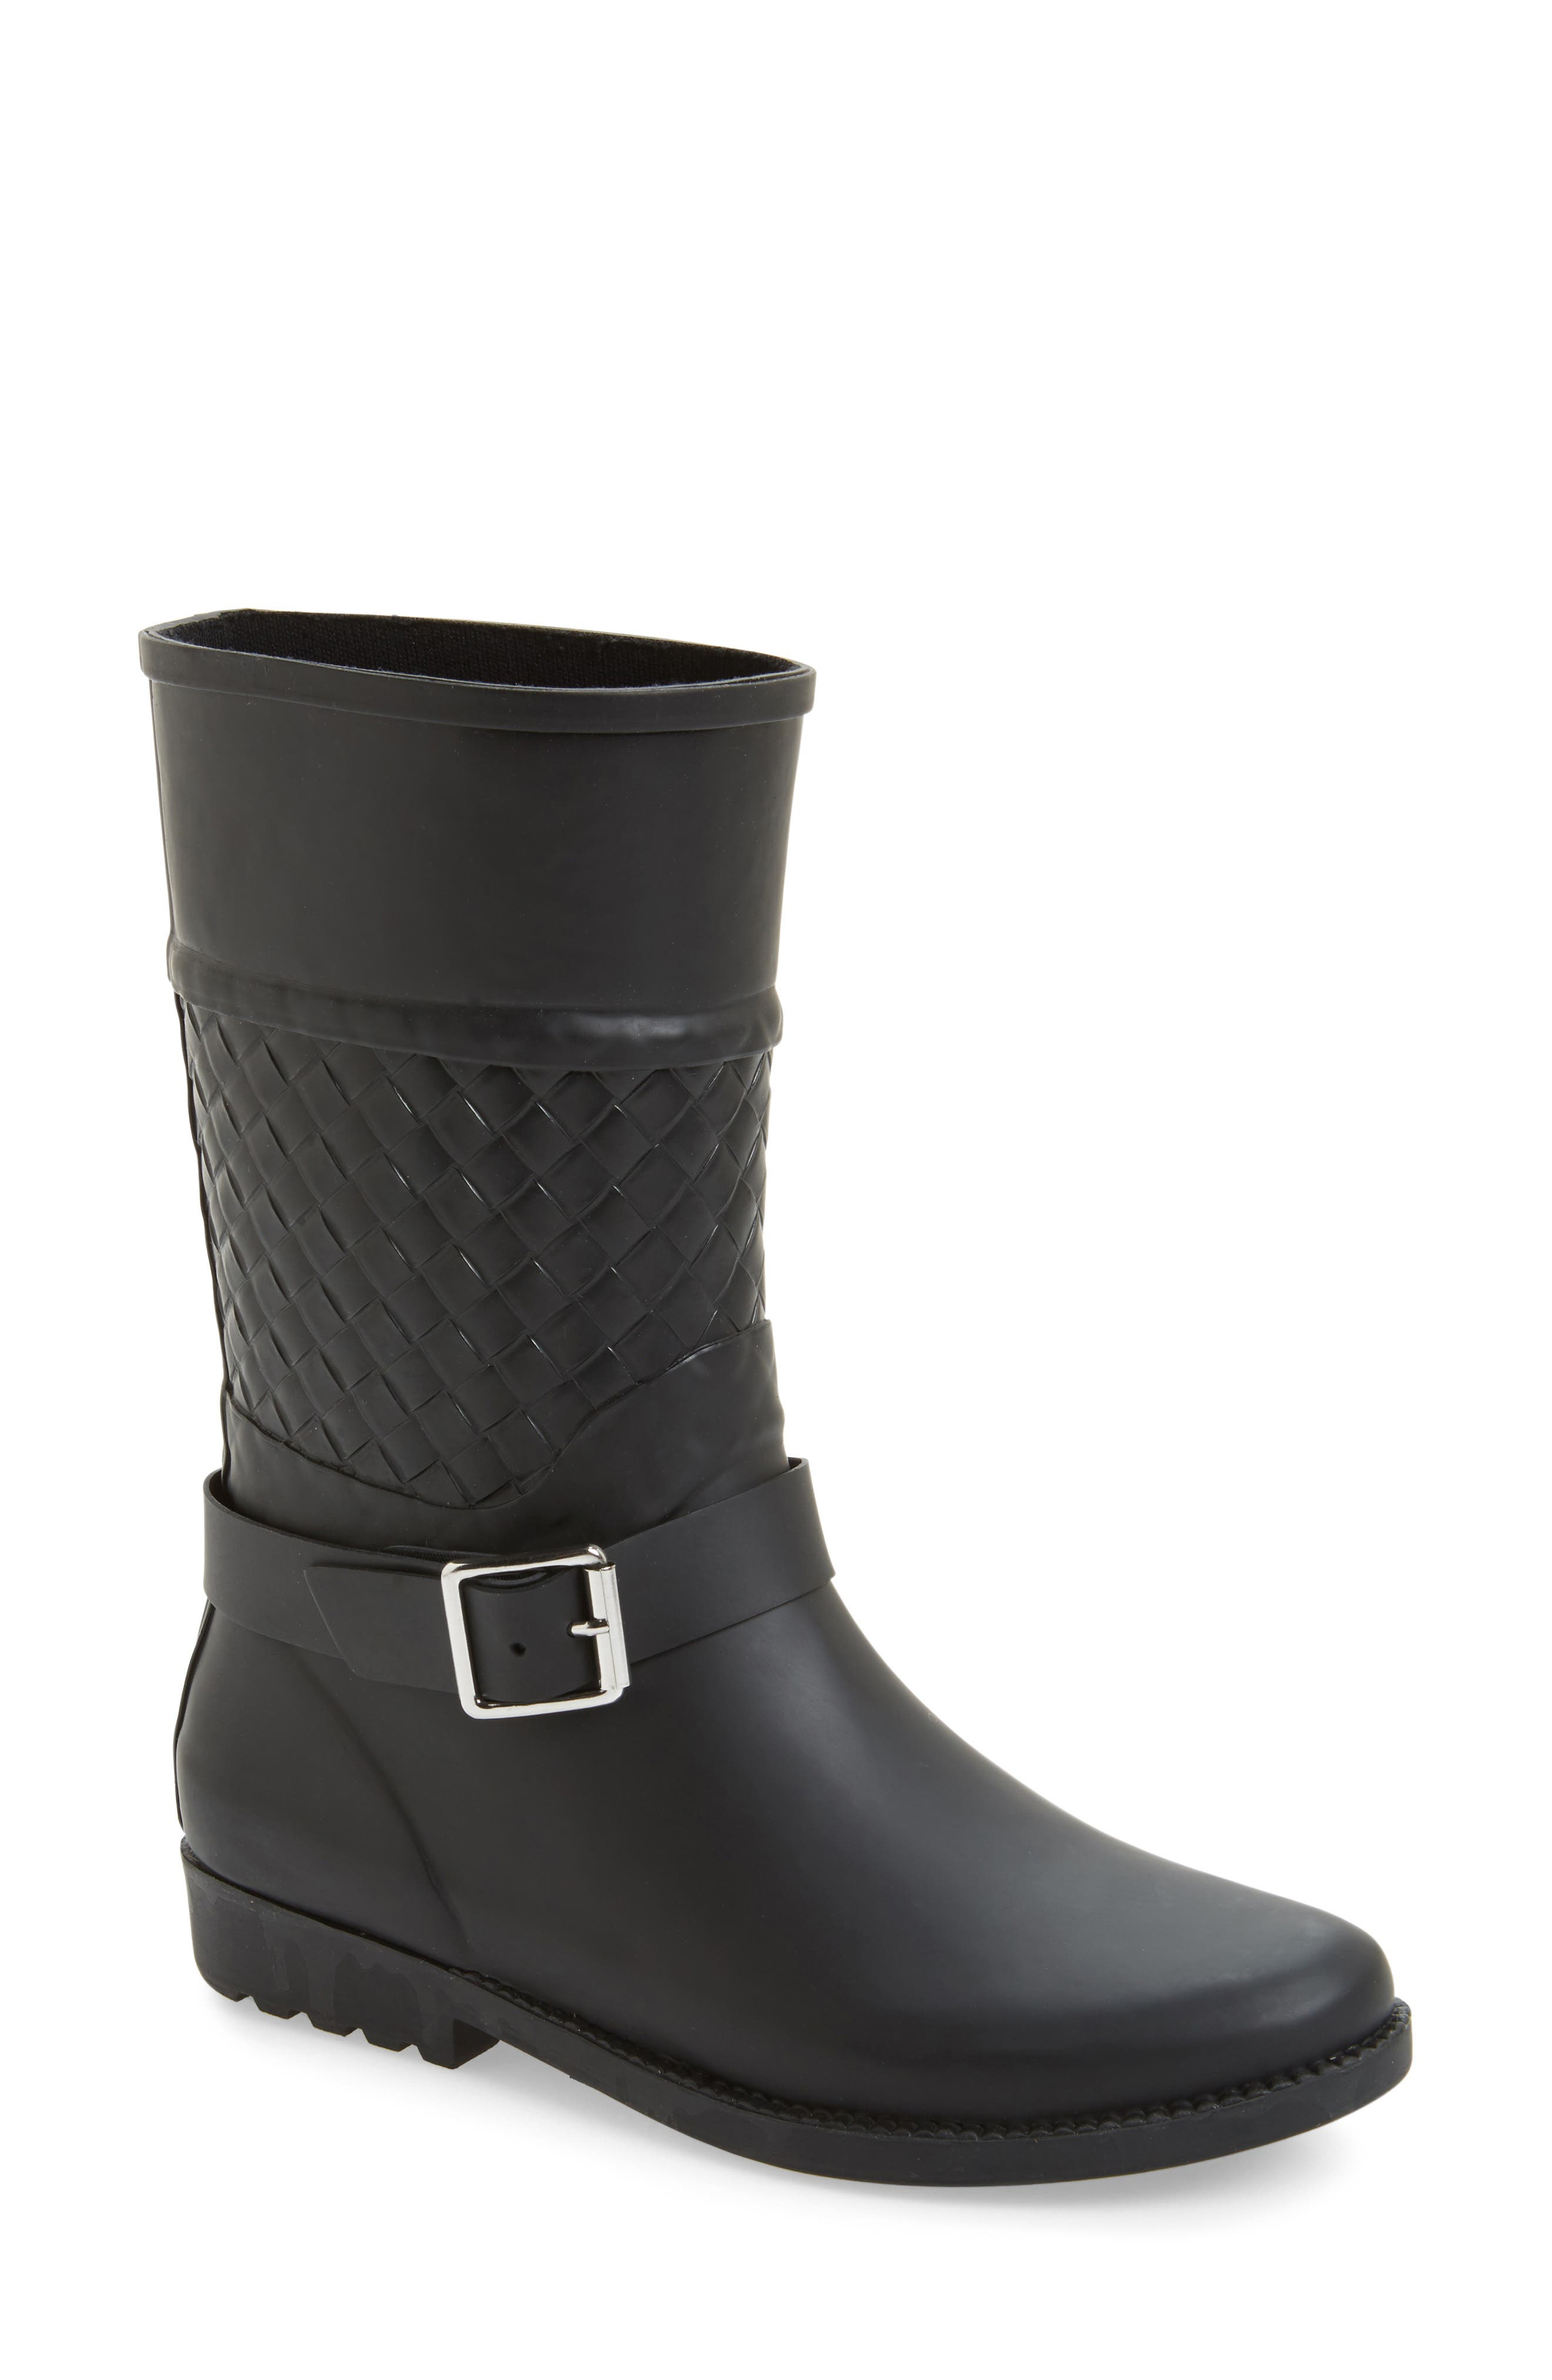 Waterproof Woven Shaft Rain Boot,                             Main thumbnail 1, color,